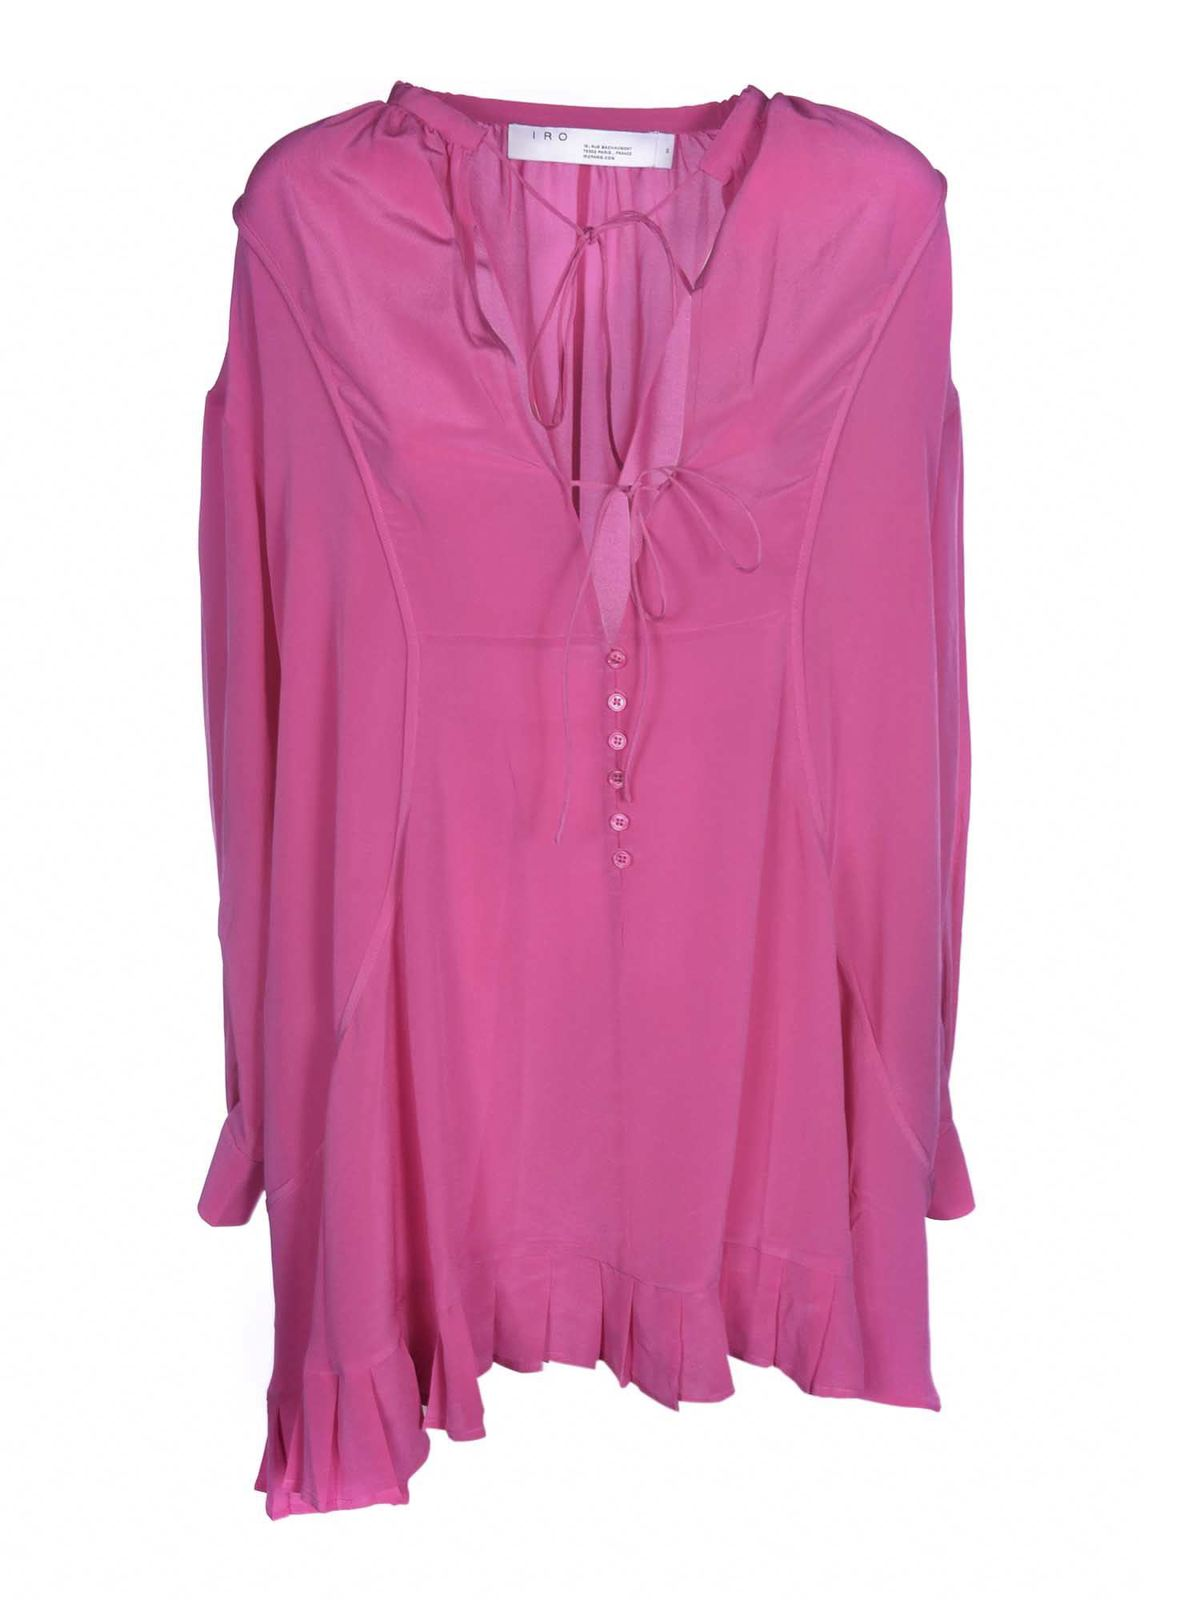 Iro Silks PINO DRESS IN FUCHSIA